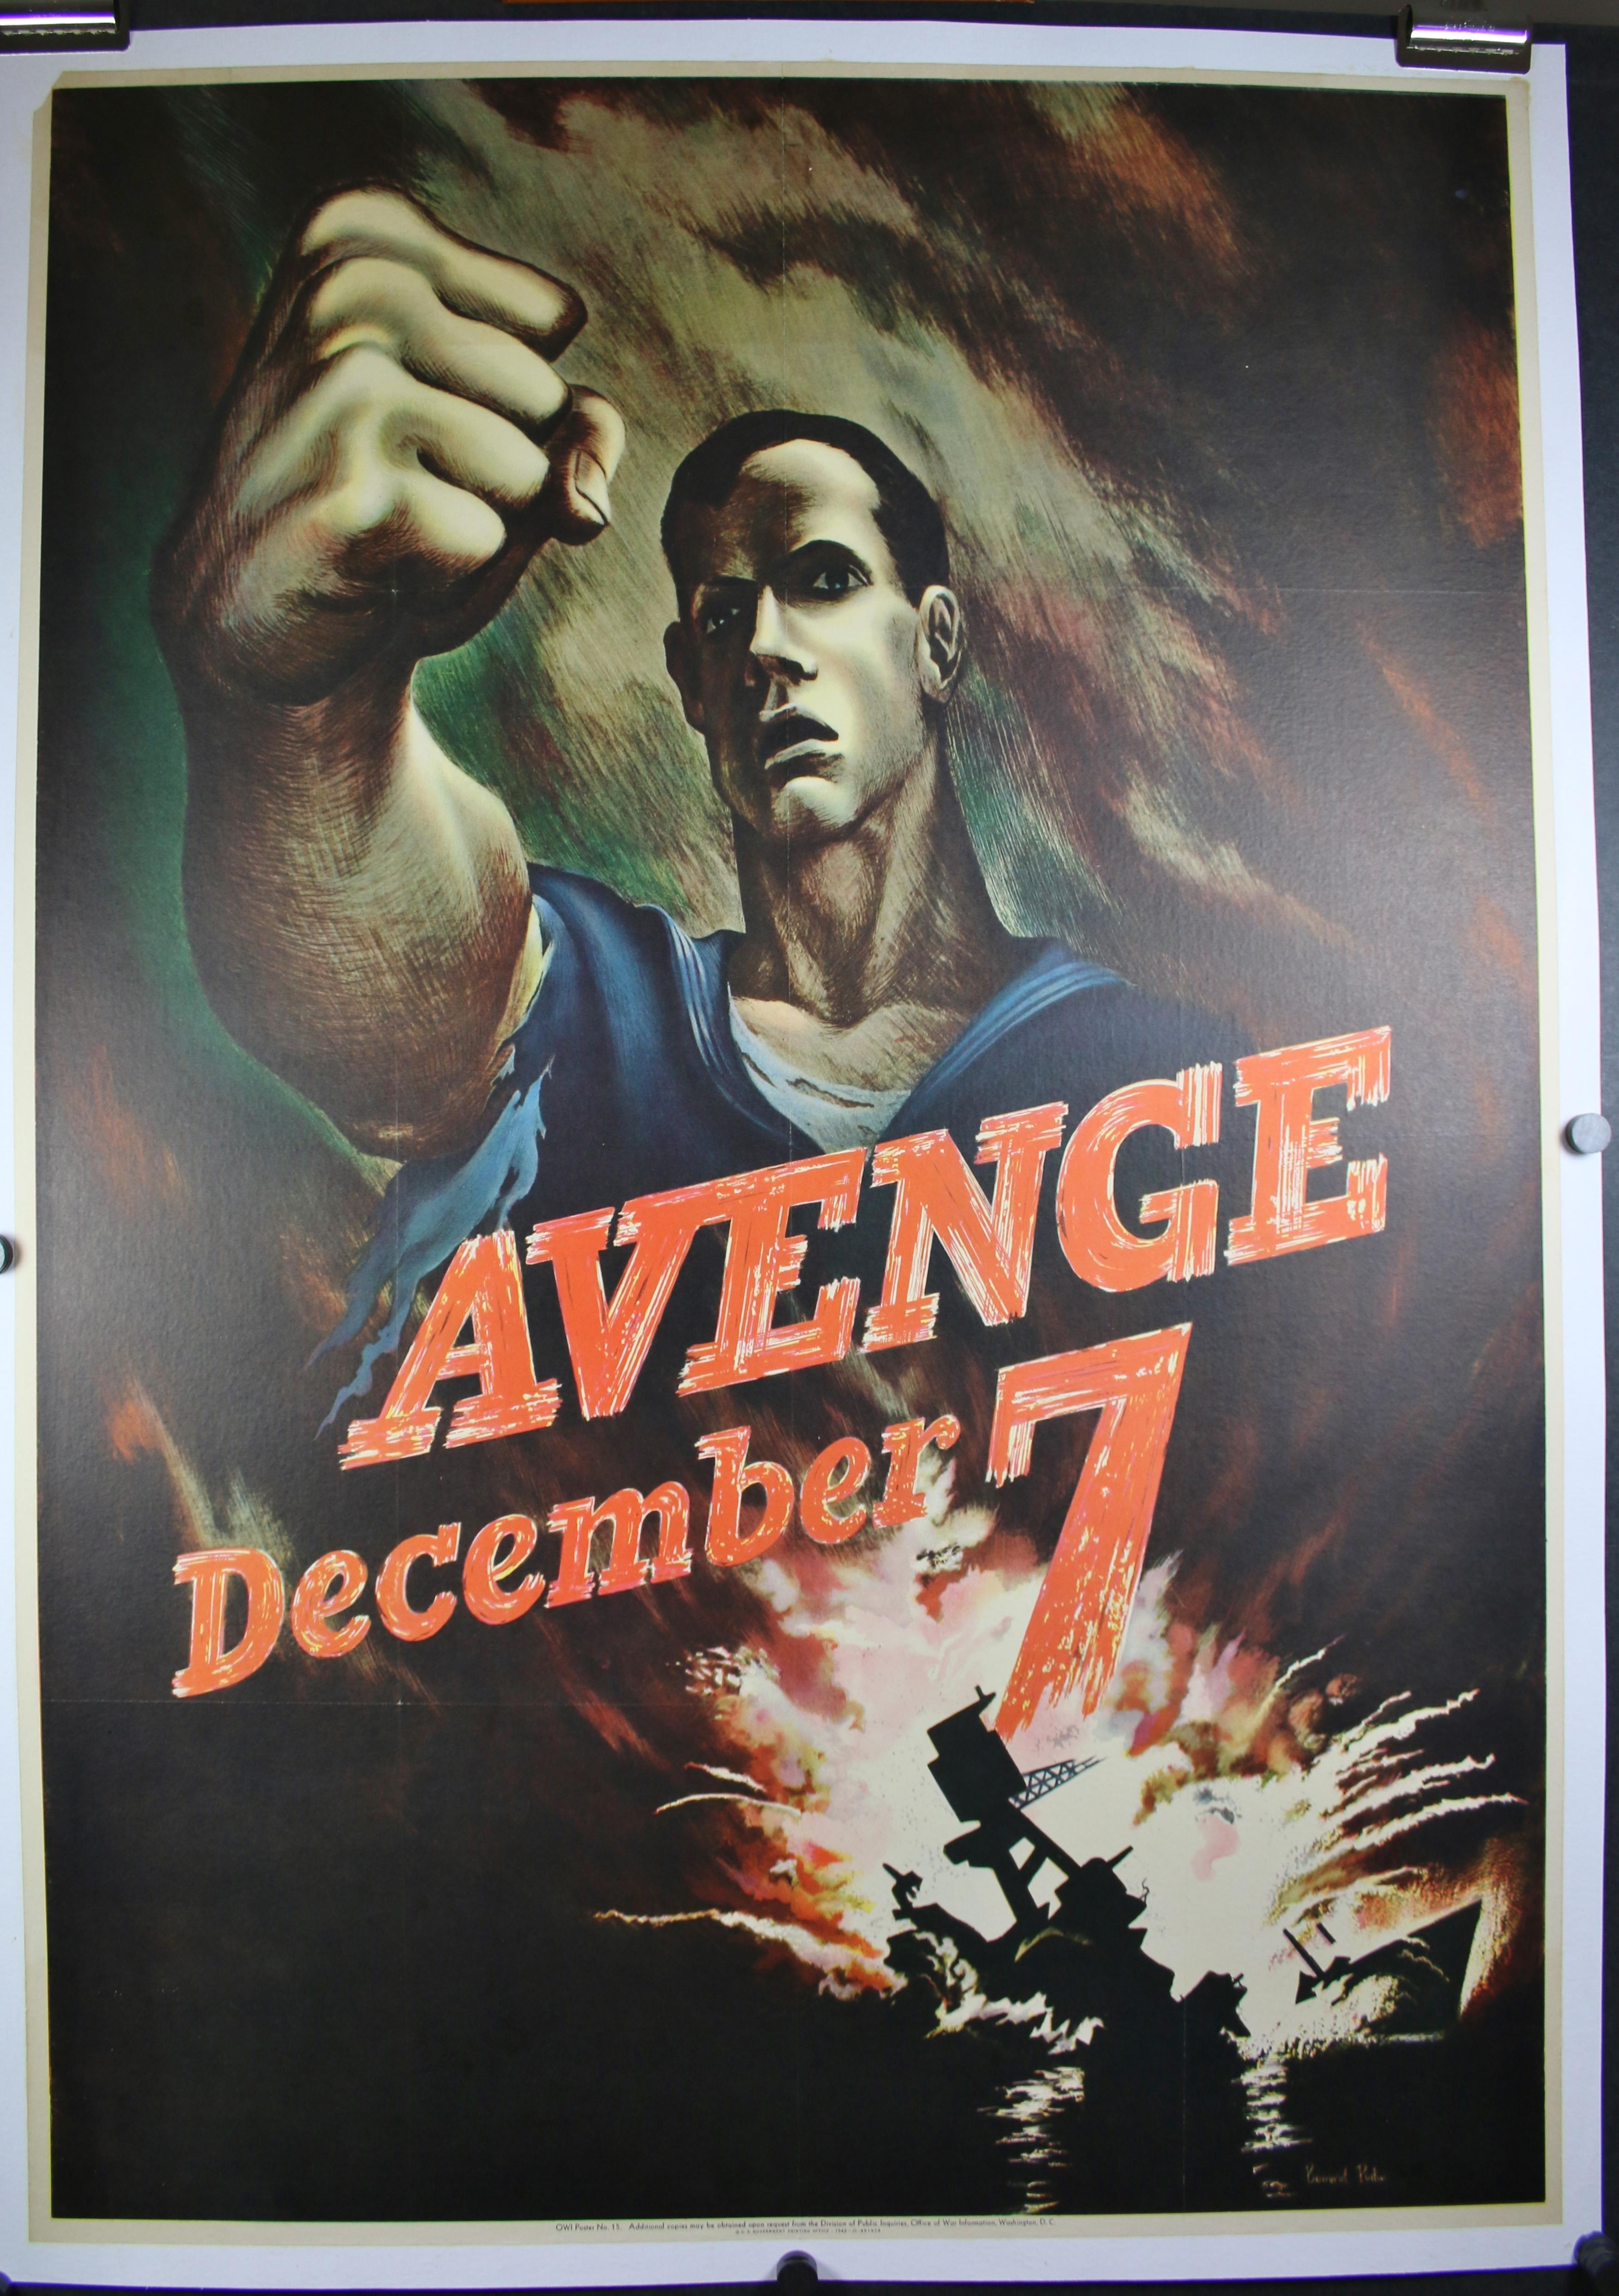 Avenge Dec 7 4577LB